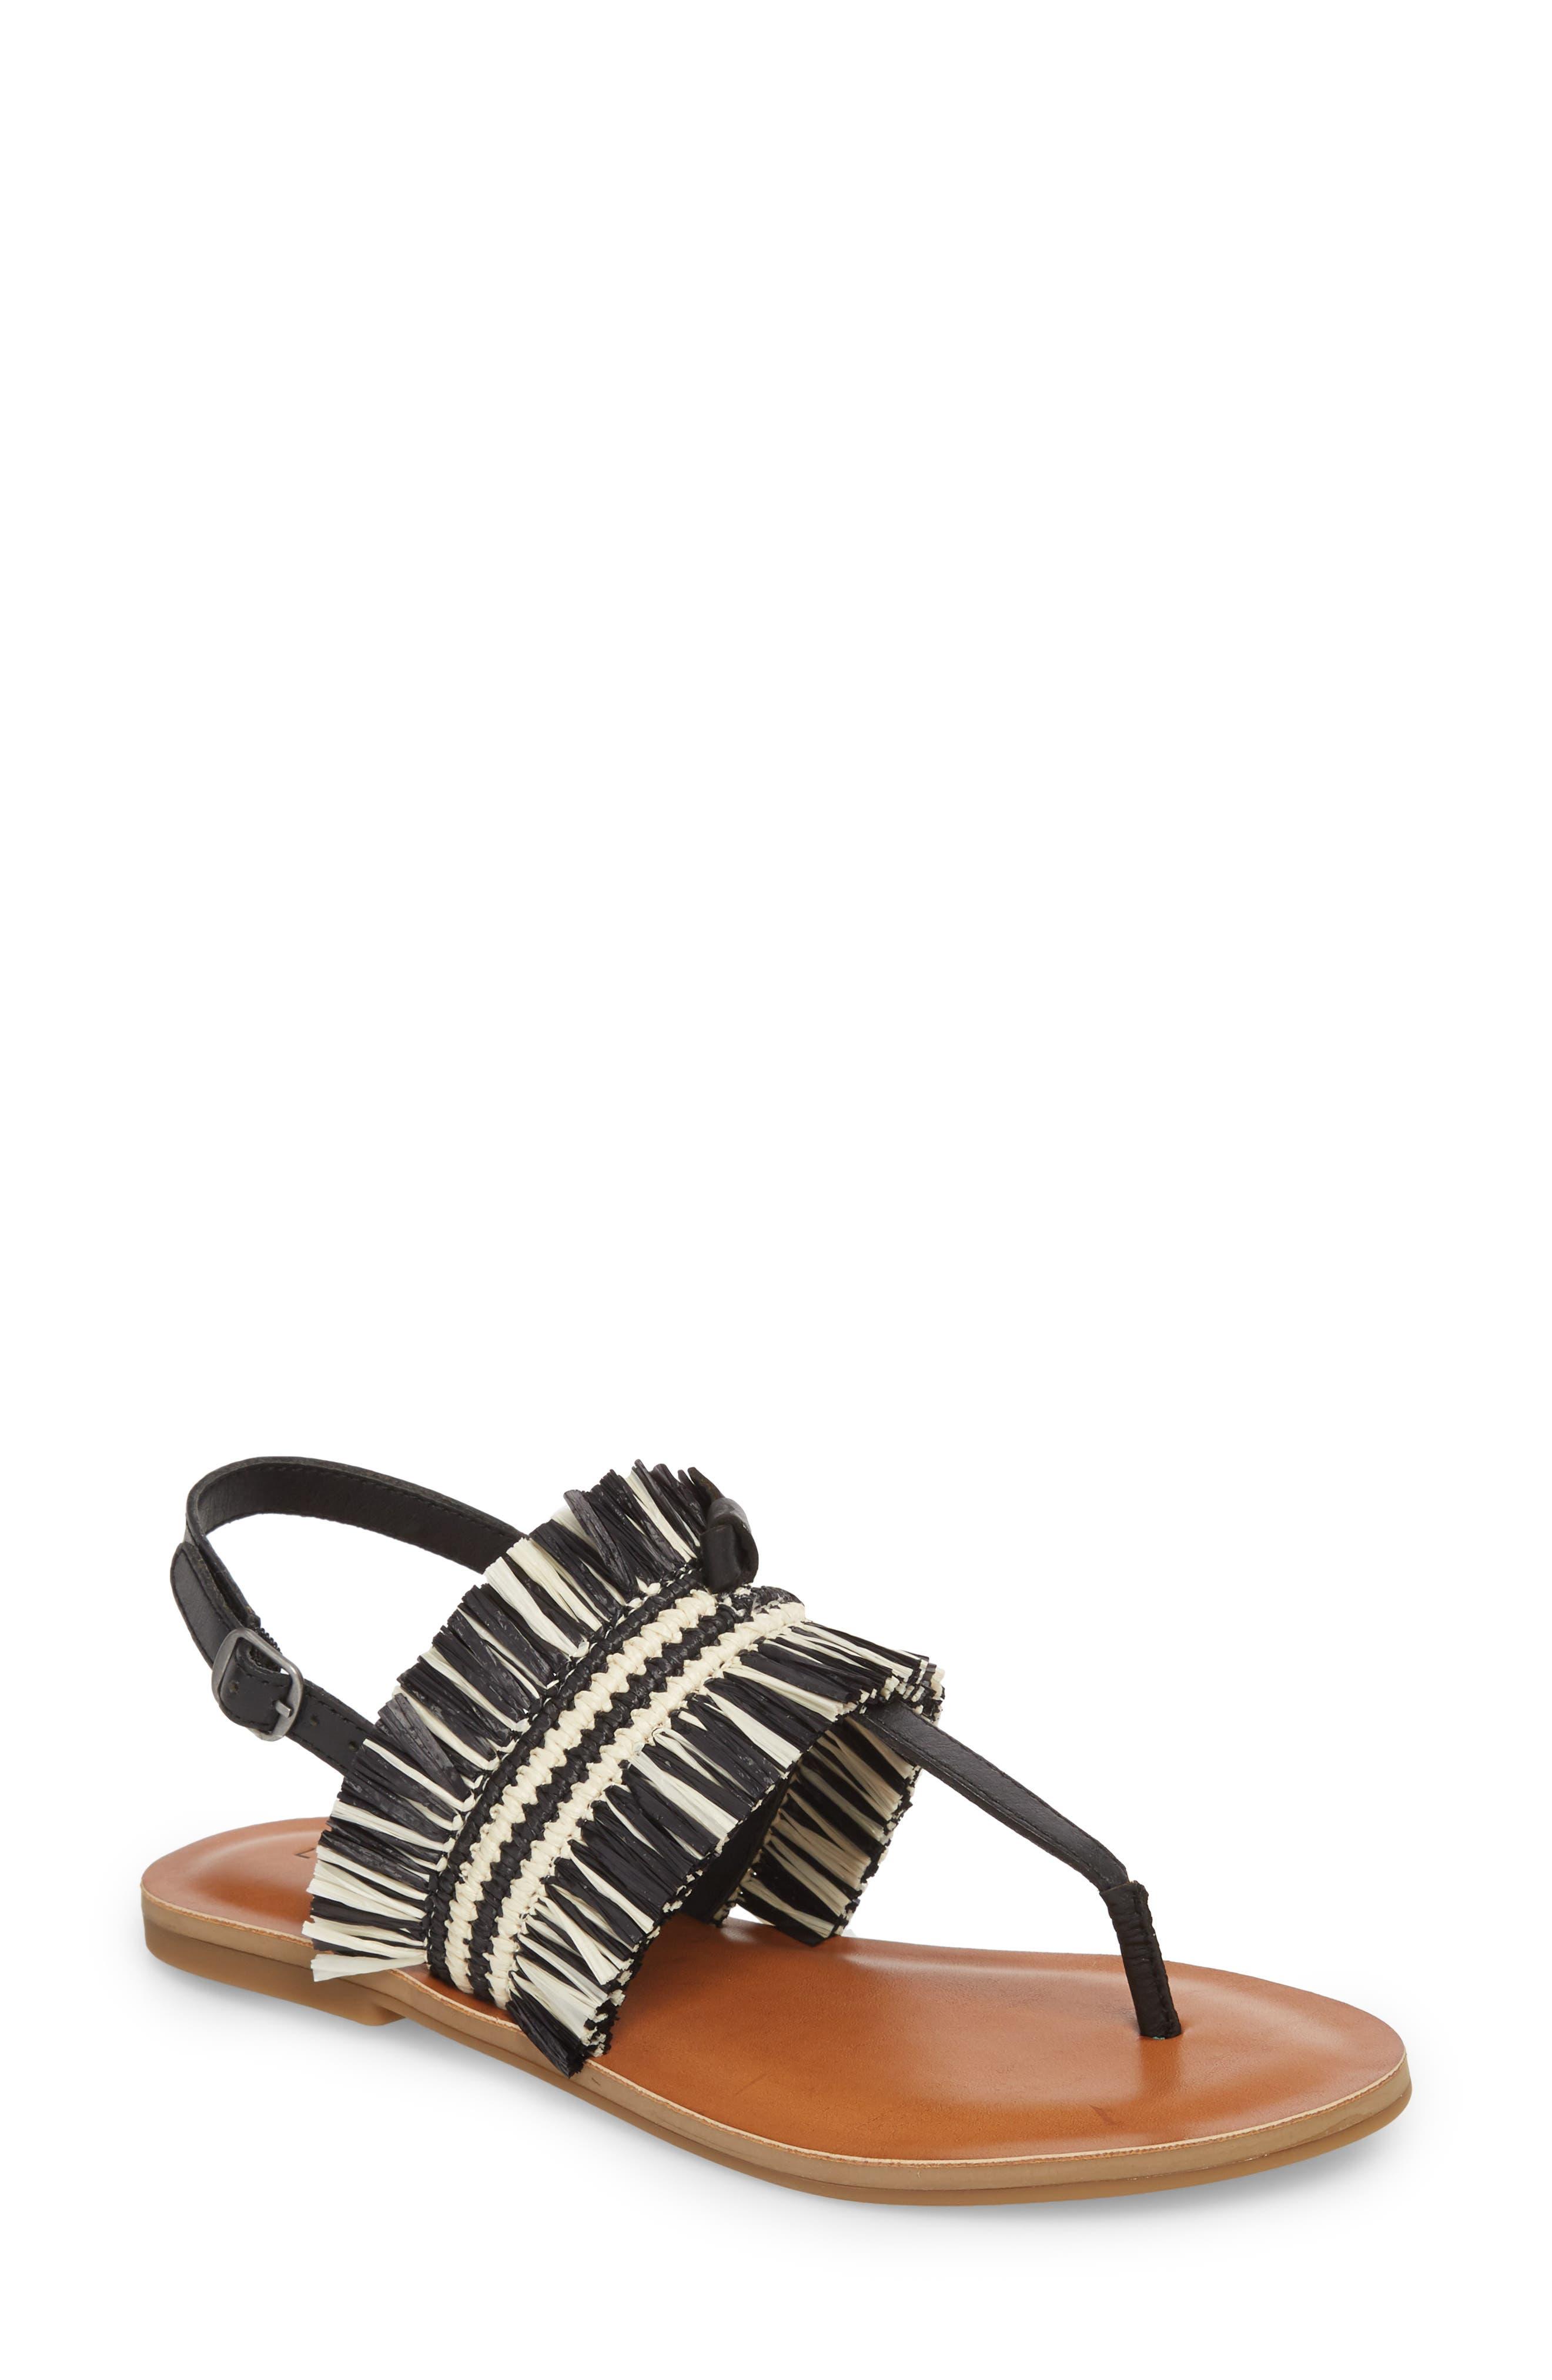 Akerlei Sandal,                         Main,                         color, BLACK/ NATURAL LEATHER